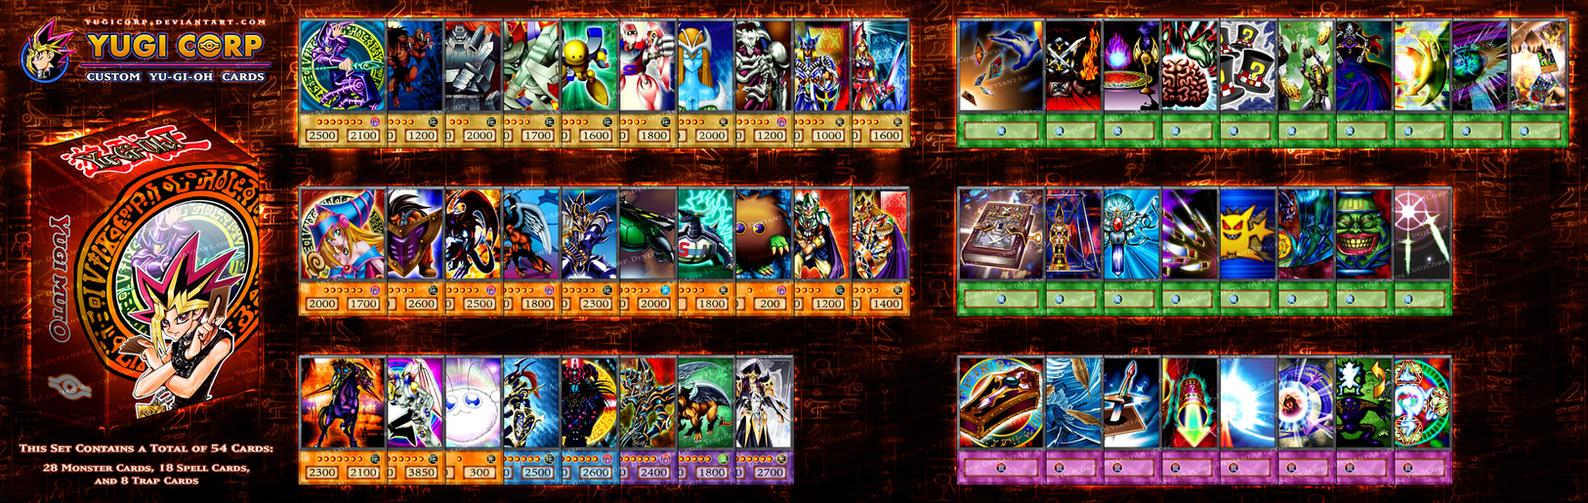 character deck yugi muto by yugicorp on deviantart